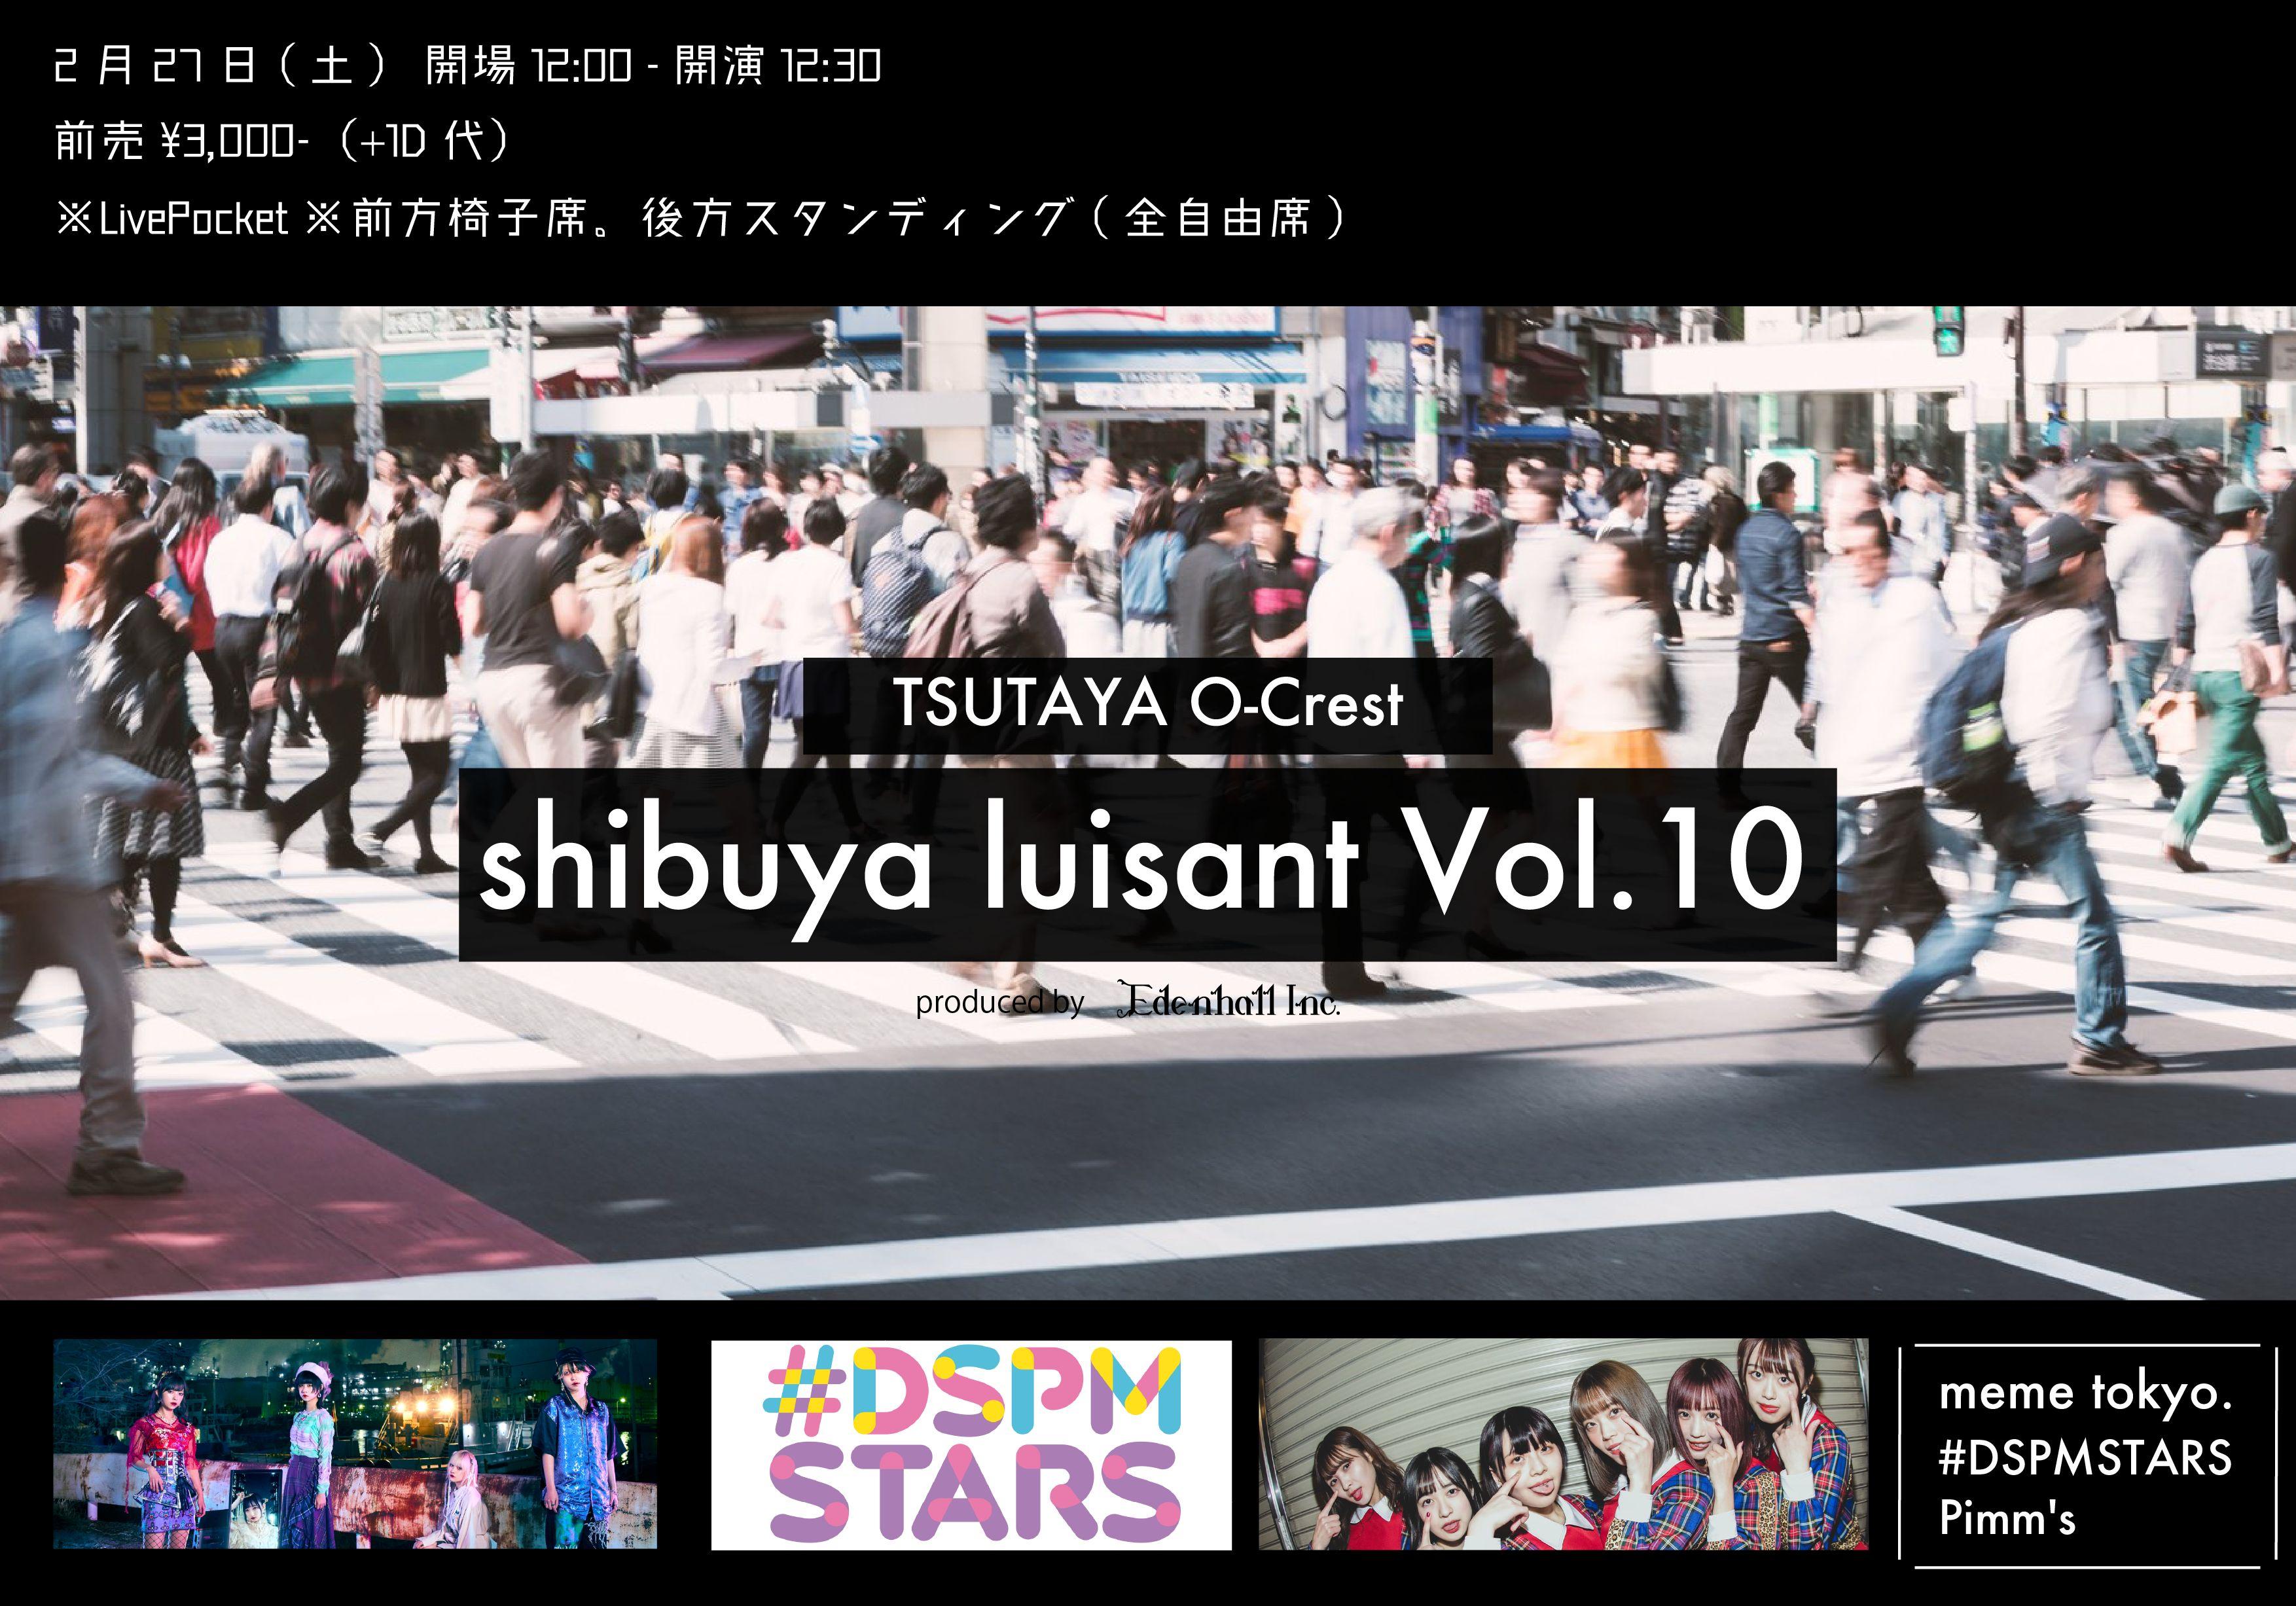 「shibuya luisant Vol.10」